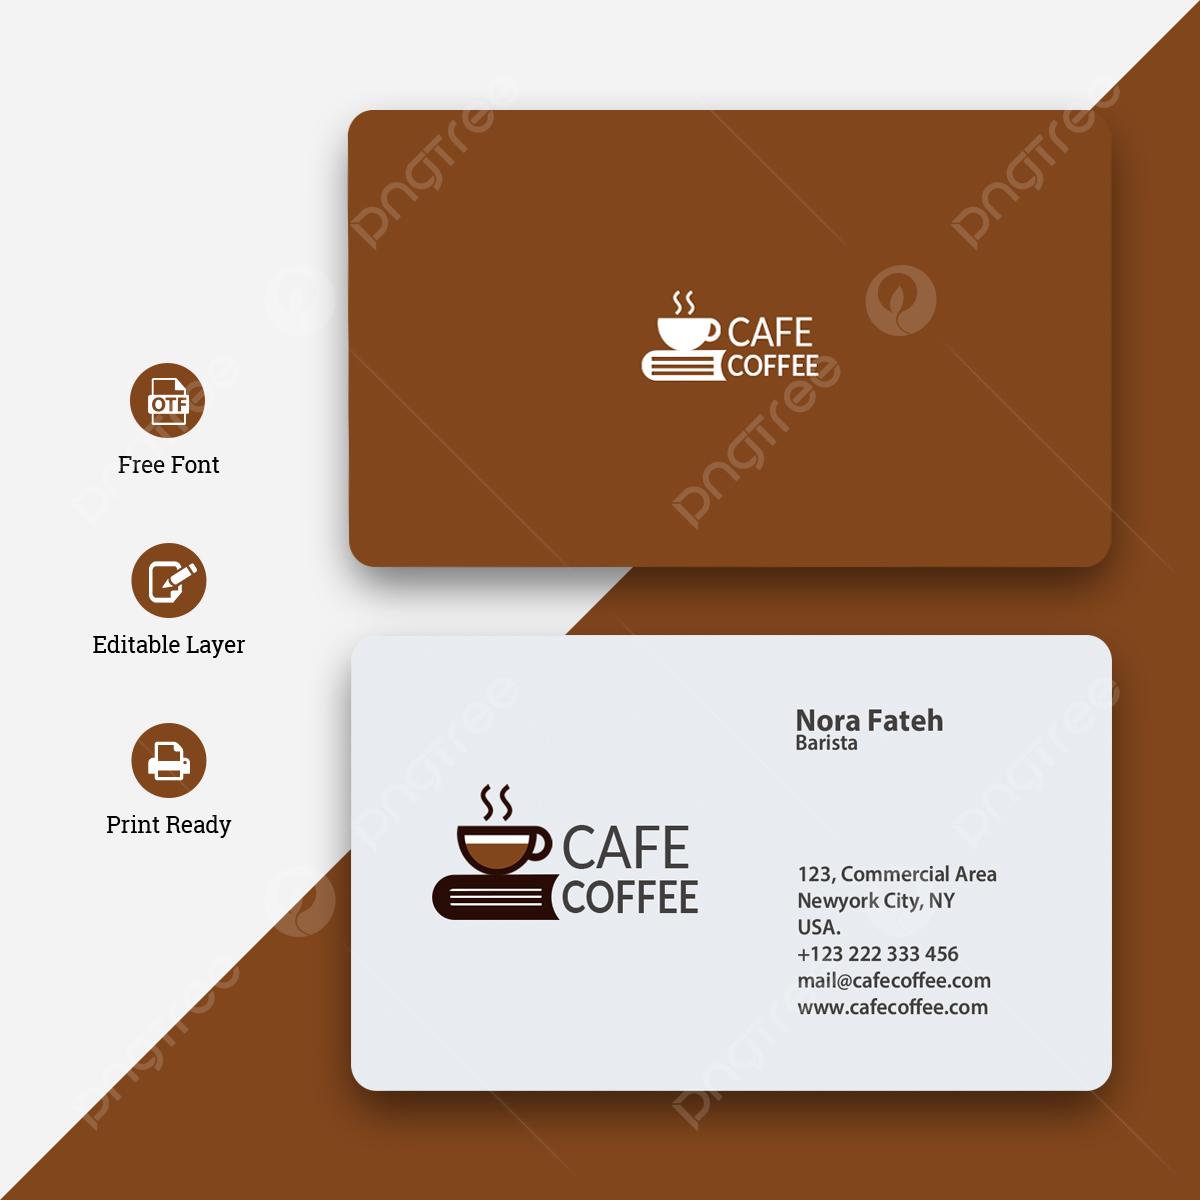 Elegant Coffee Shop Business Card Template Download on Pngtree With Coffee Business Card Template Free